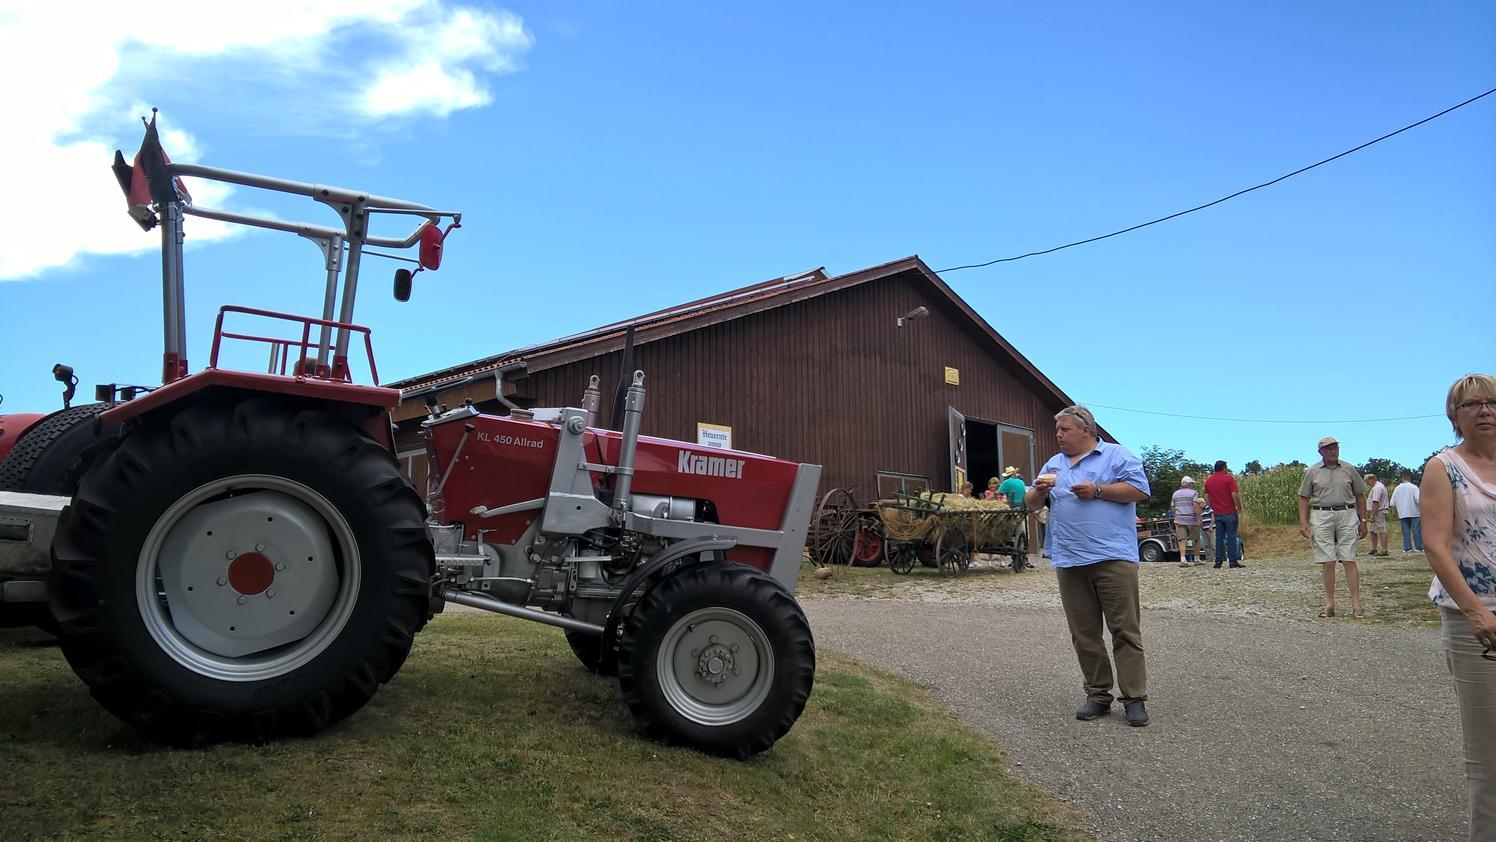 Traktor 16-3-12 1496 842.jpg - 216.14 KB